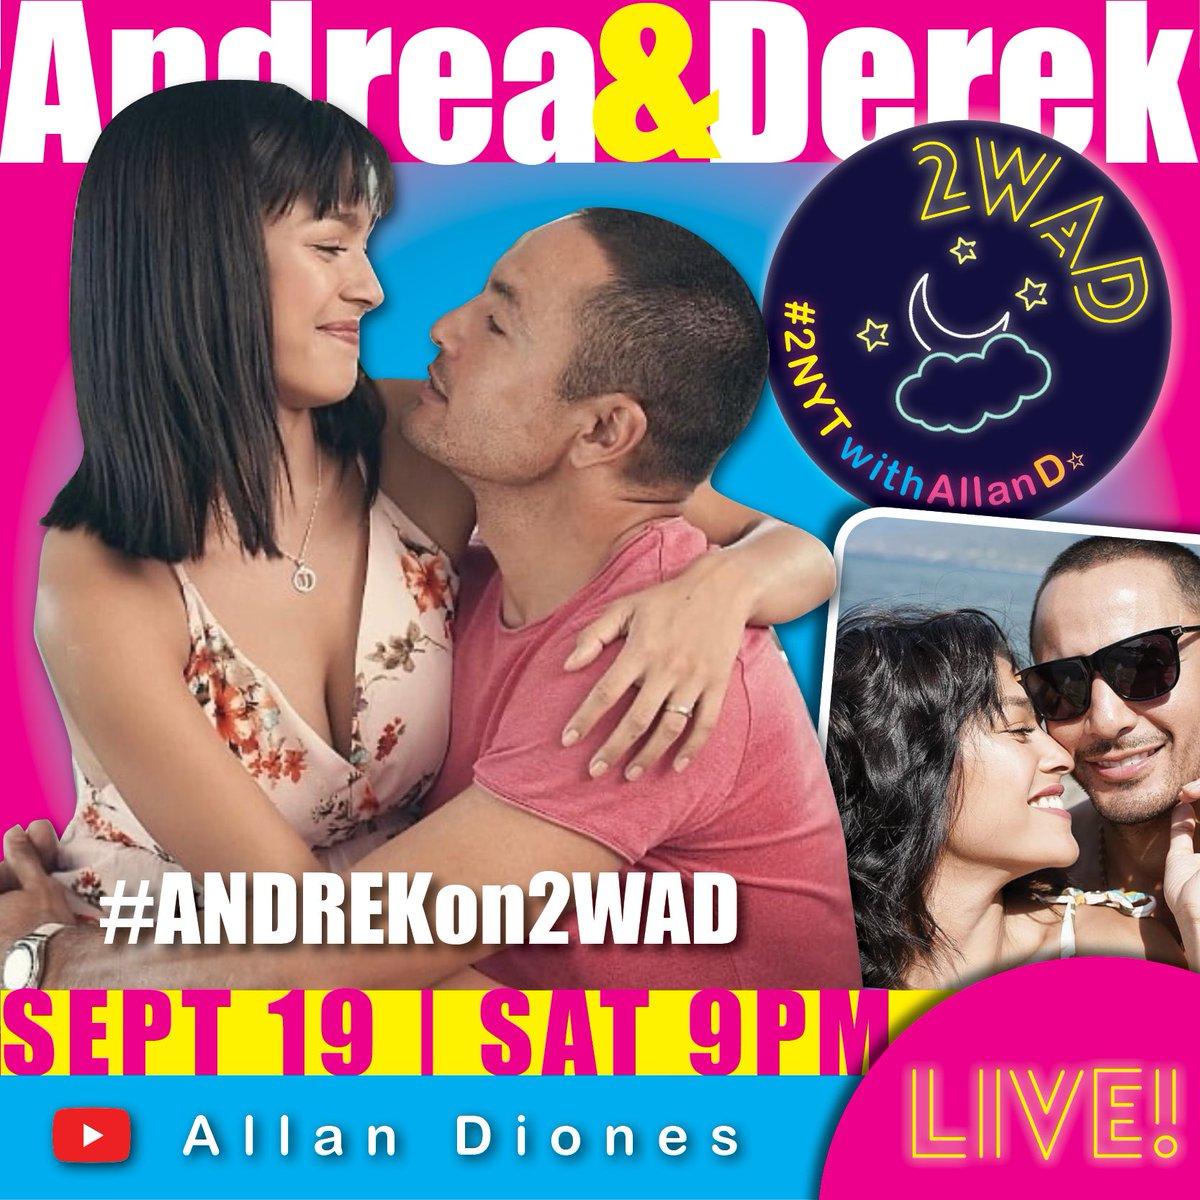 ANDREKS!! ♥️  LIVE Na LIVE Makakasama naten tomorrow  ang Mag-BABY na sina @andreaetorres & @kingderekramsay! 😍  #2NYTwithAllanD 🌙 #2WAD  #ANDREKon2WAD  Sept 19 | Saturday | 9PM Allan Diones YouTube channel ▶️  See you there, guysh!! 🙌🏼 https://t.co/Fktz3HaOir